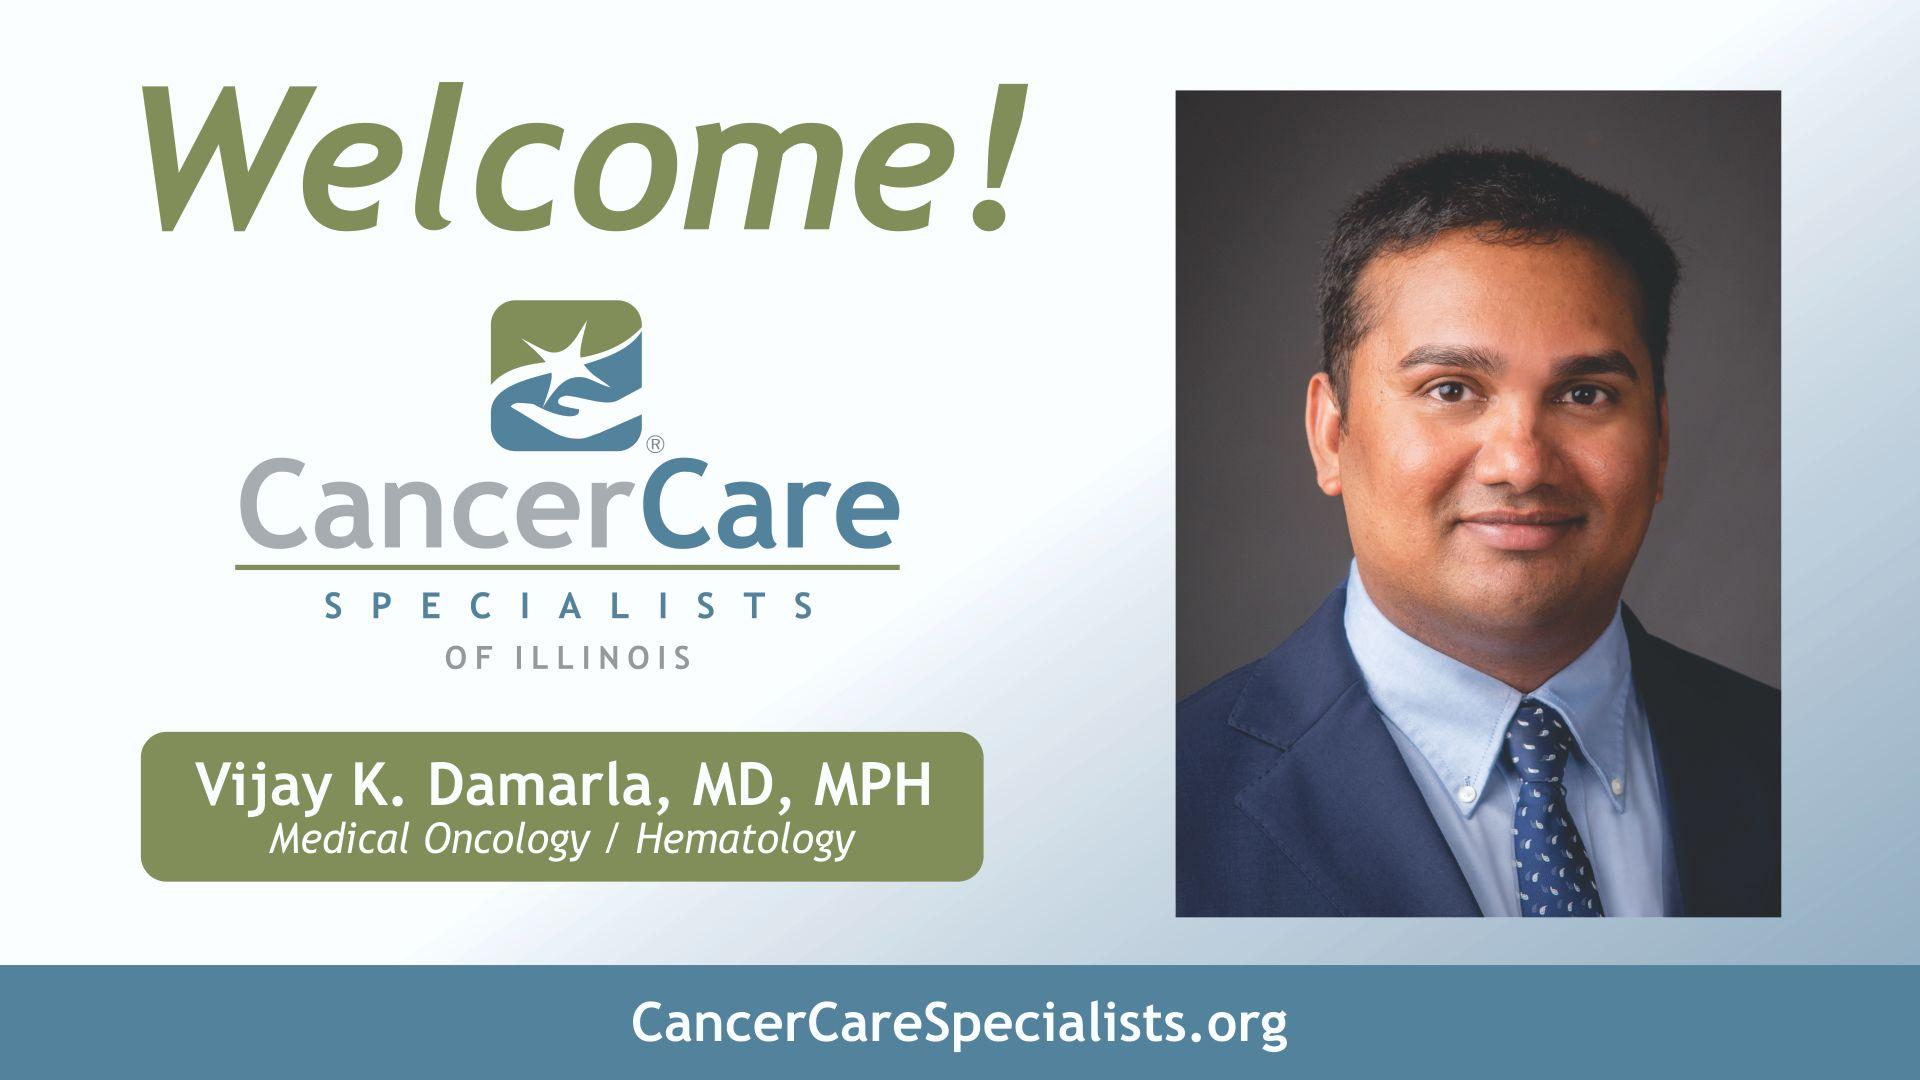 Welcome Dr. Damarla